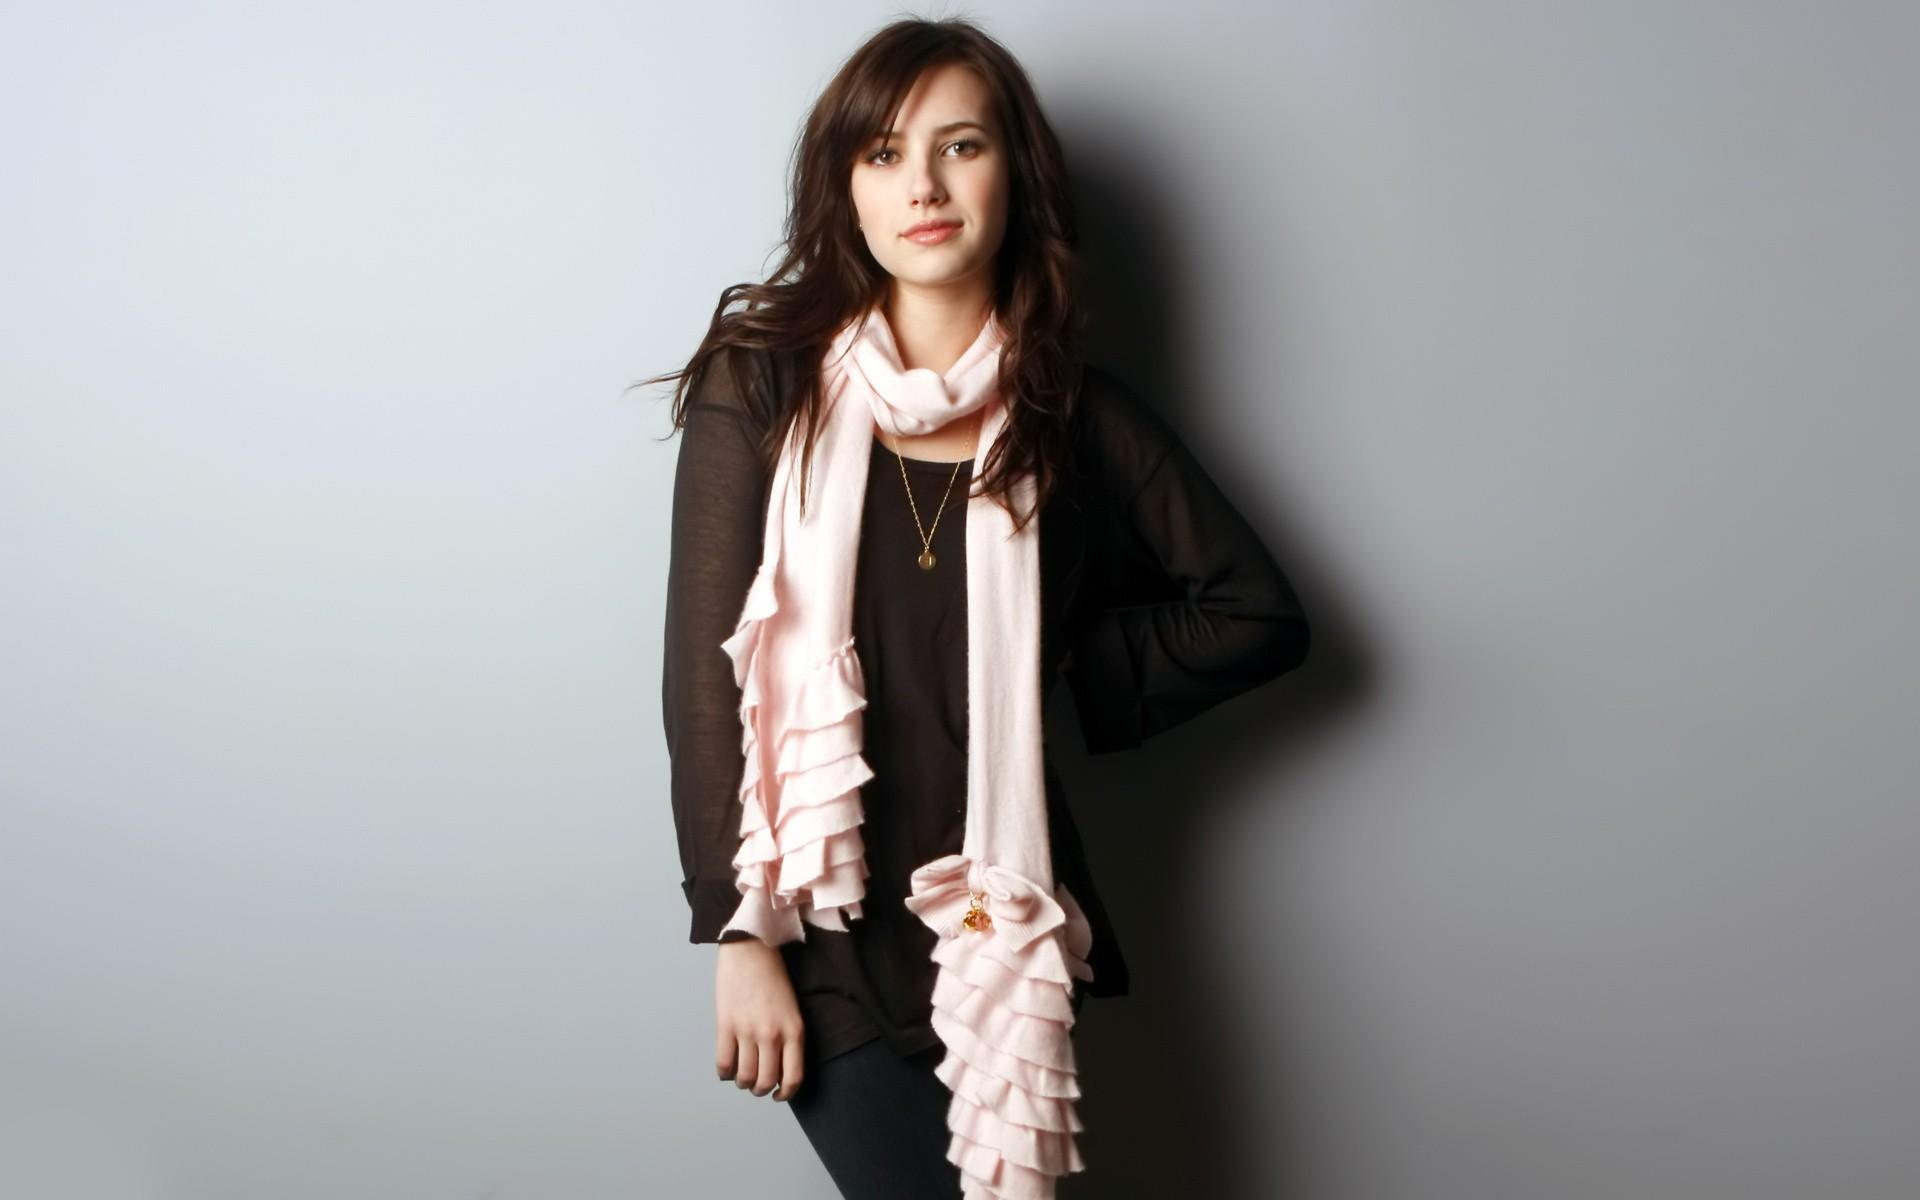 emma-roberts-sexy-stills